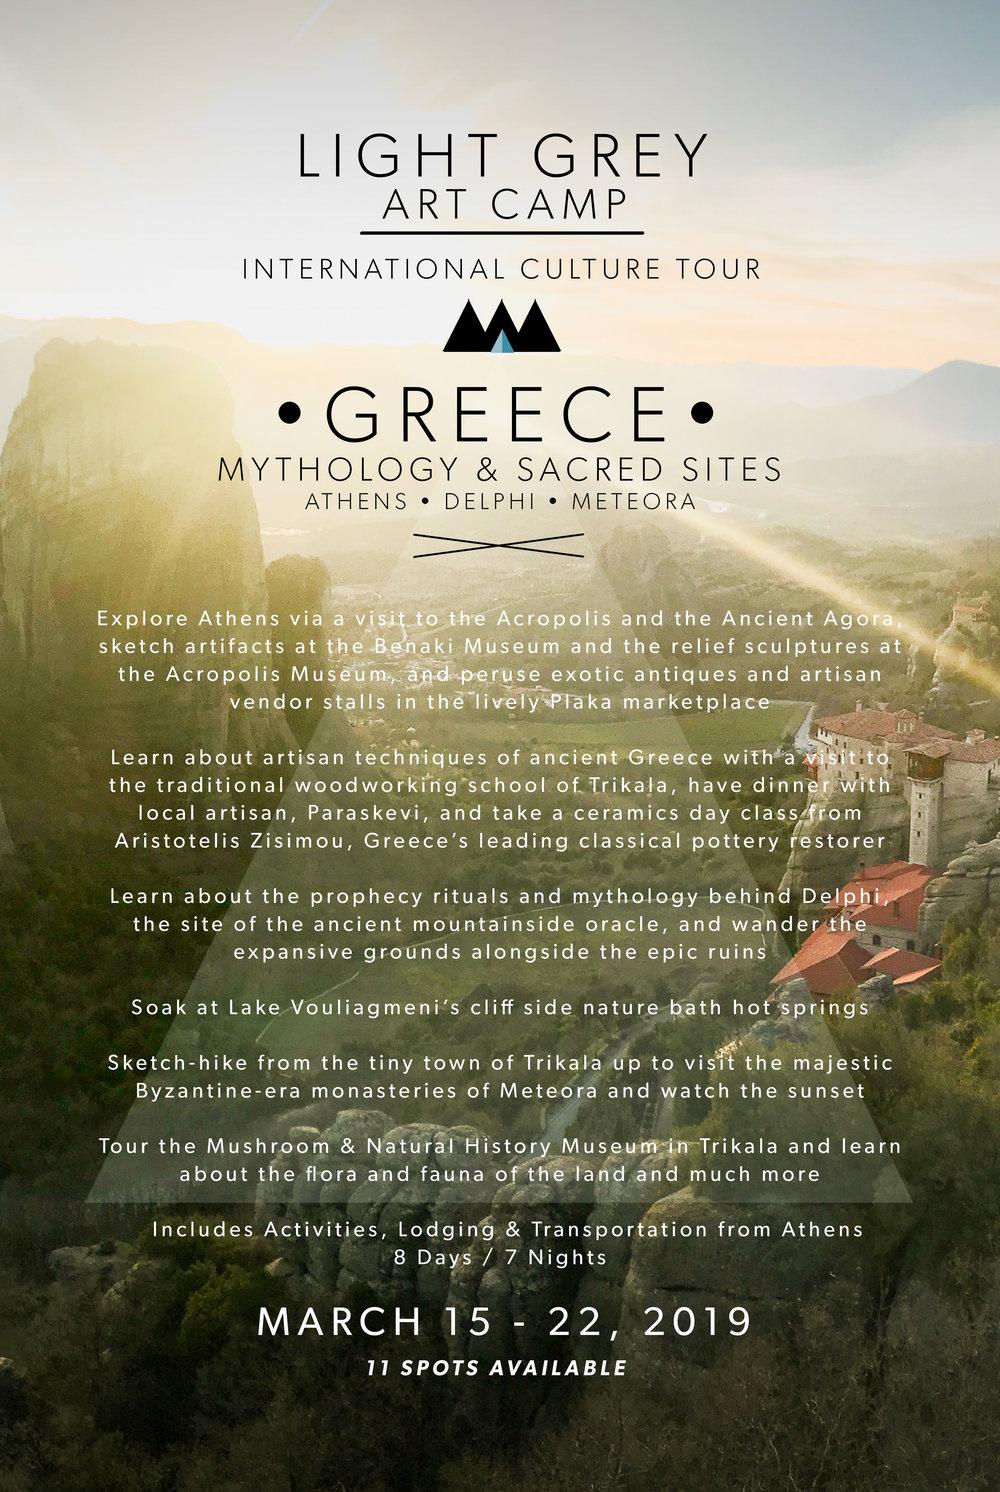 LightGrey_TravelTemplate_VerticalTriangleImage_Greece.jpg